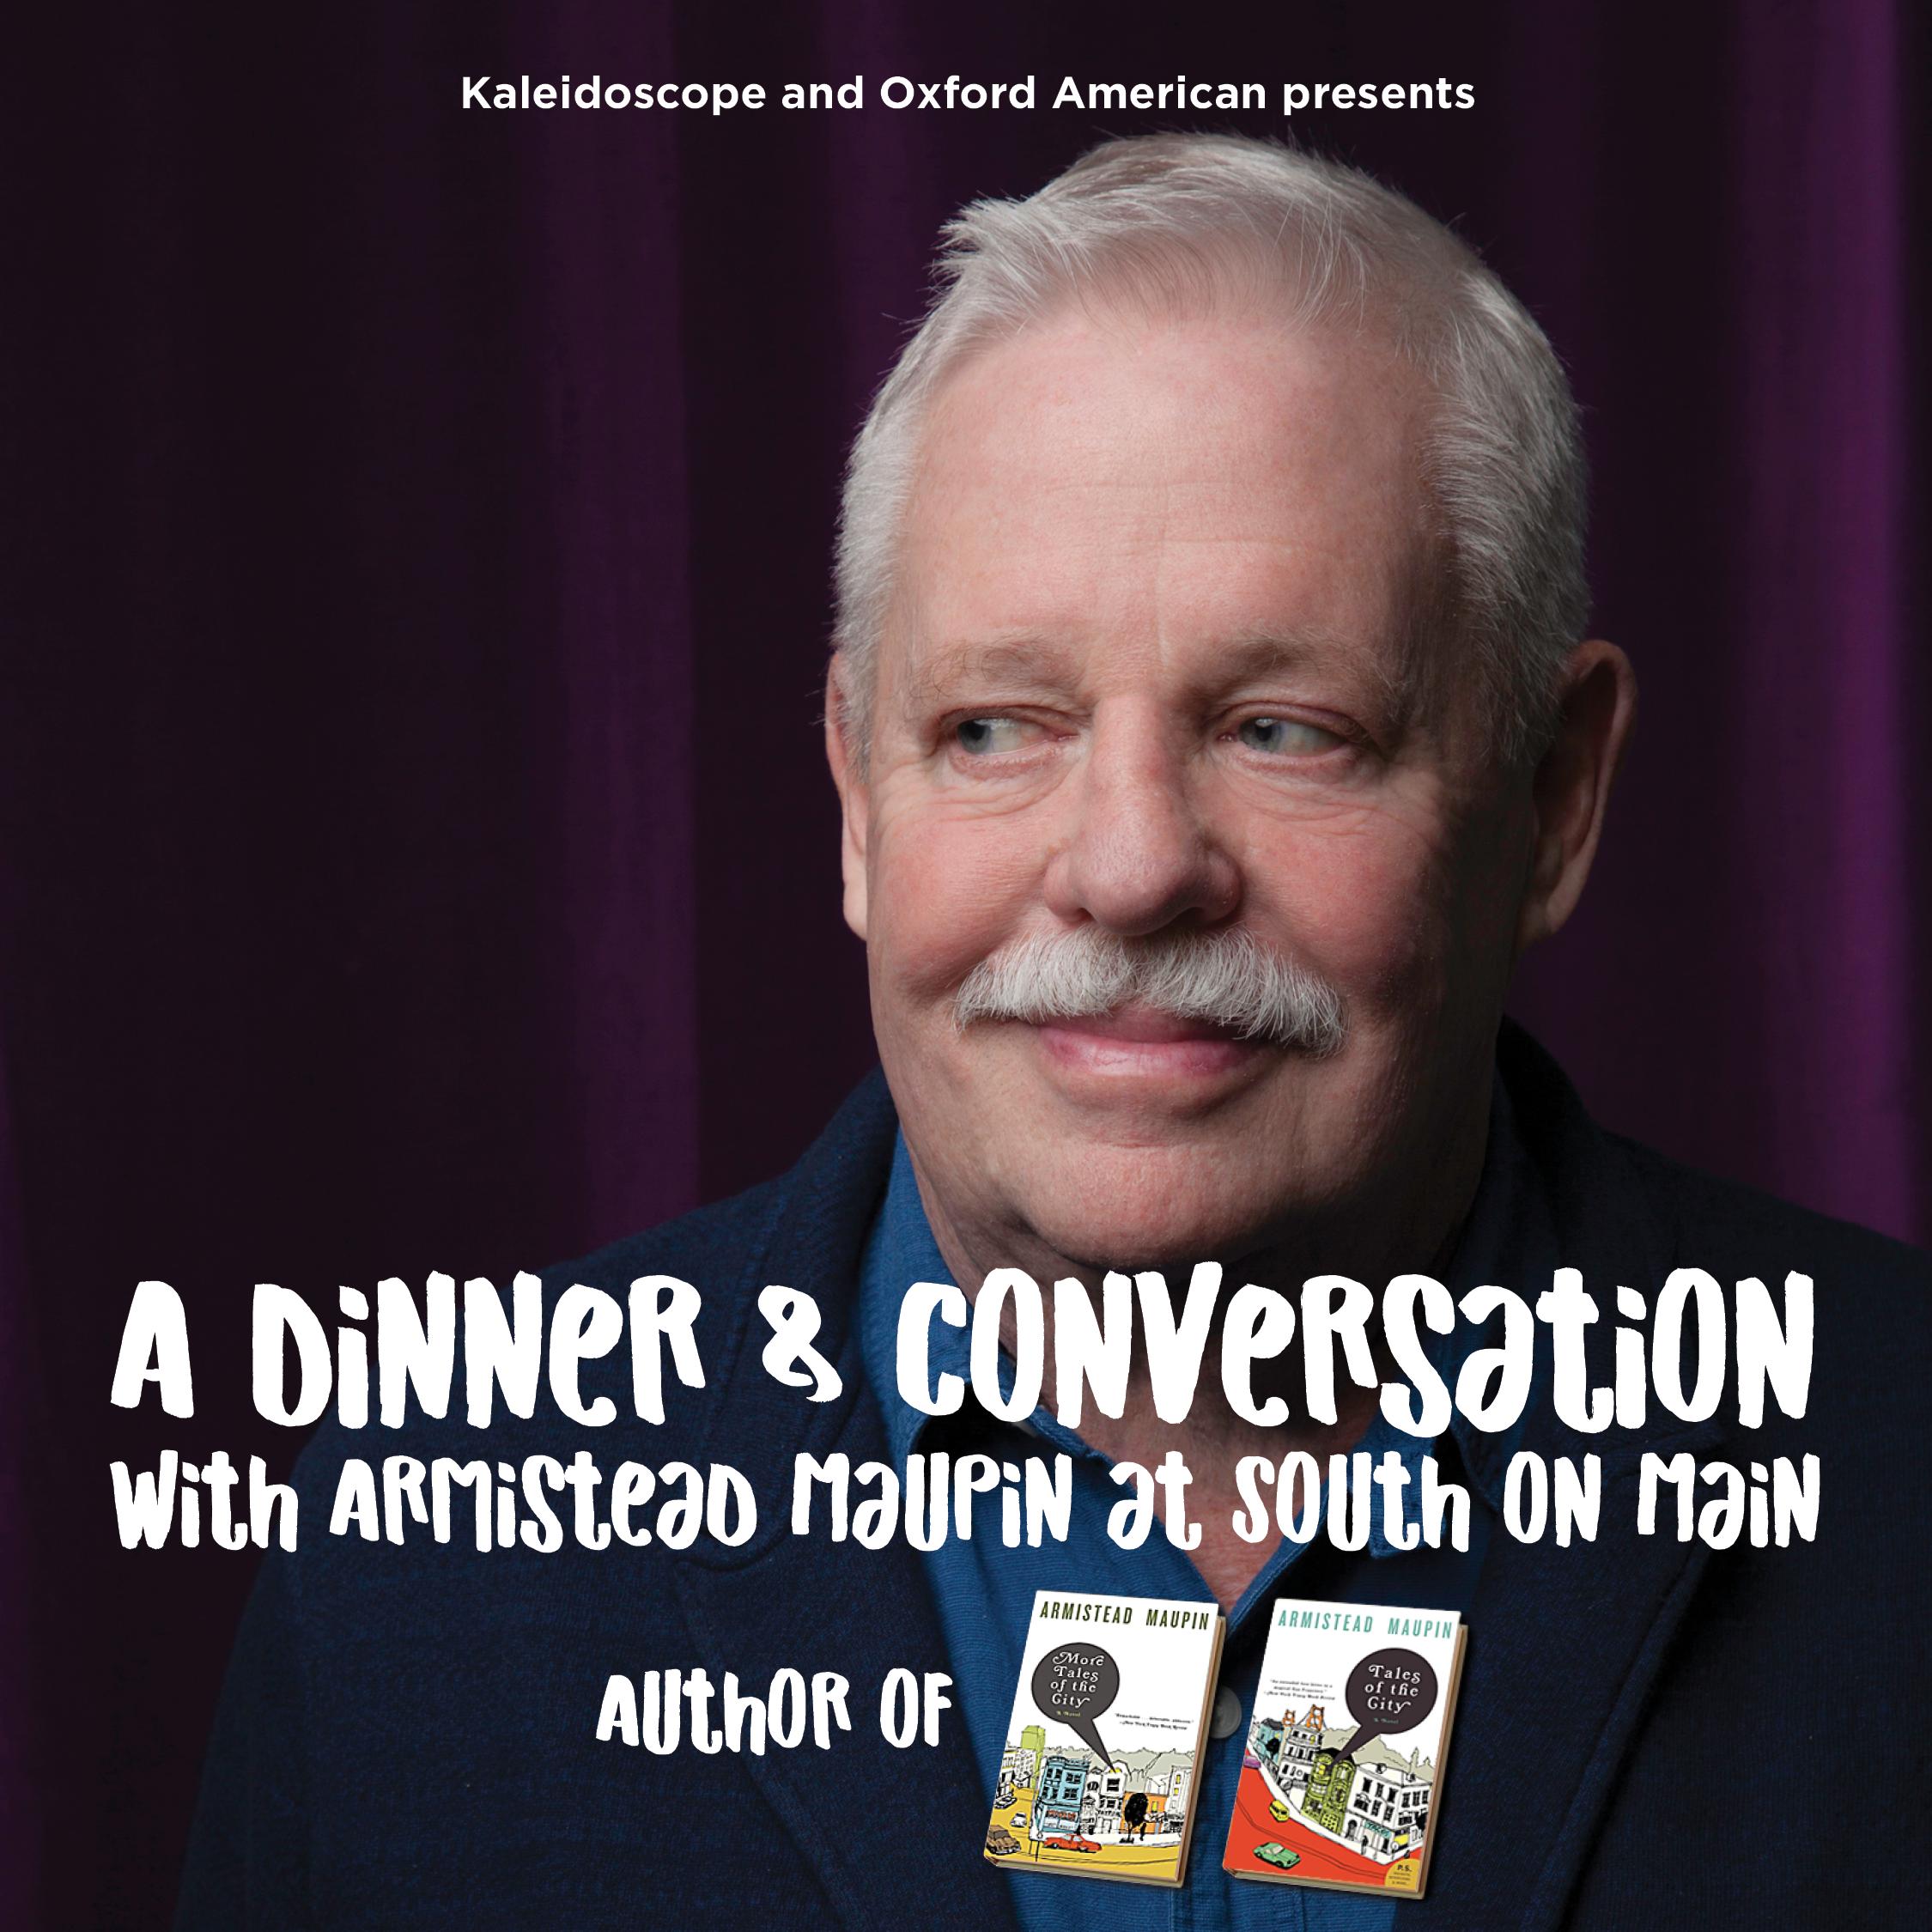 Dinner & Conversation with Armistead Maupin